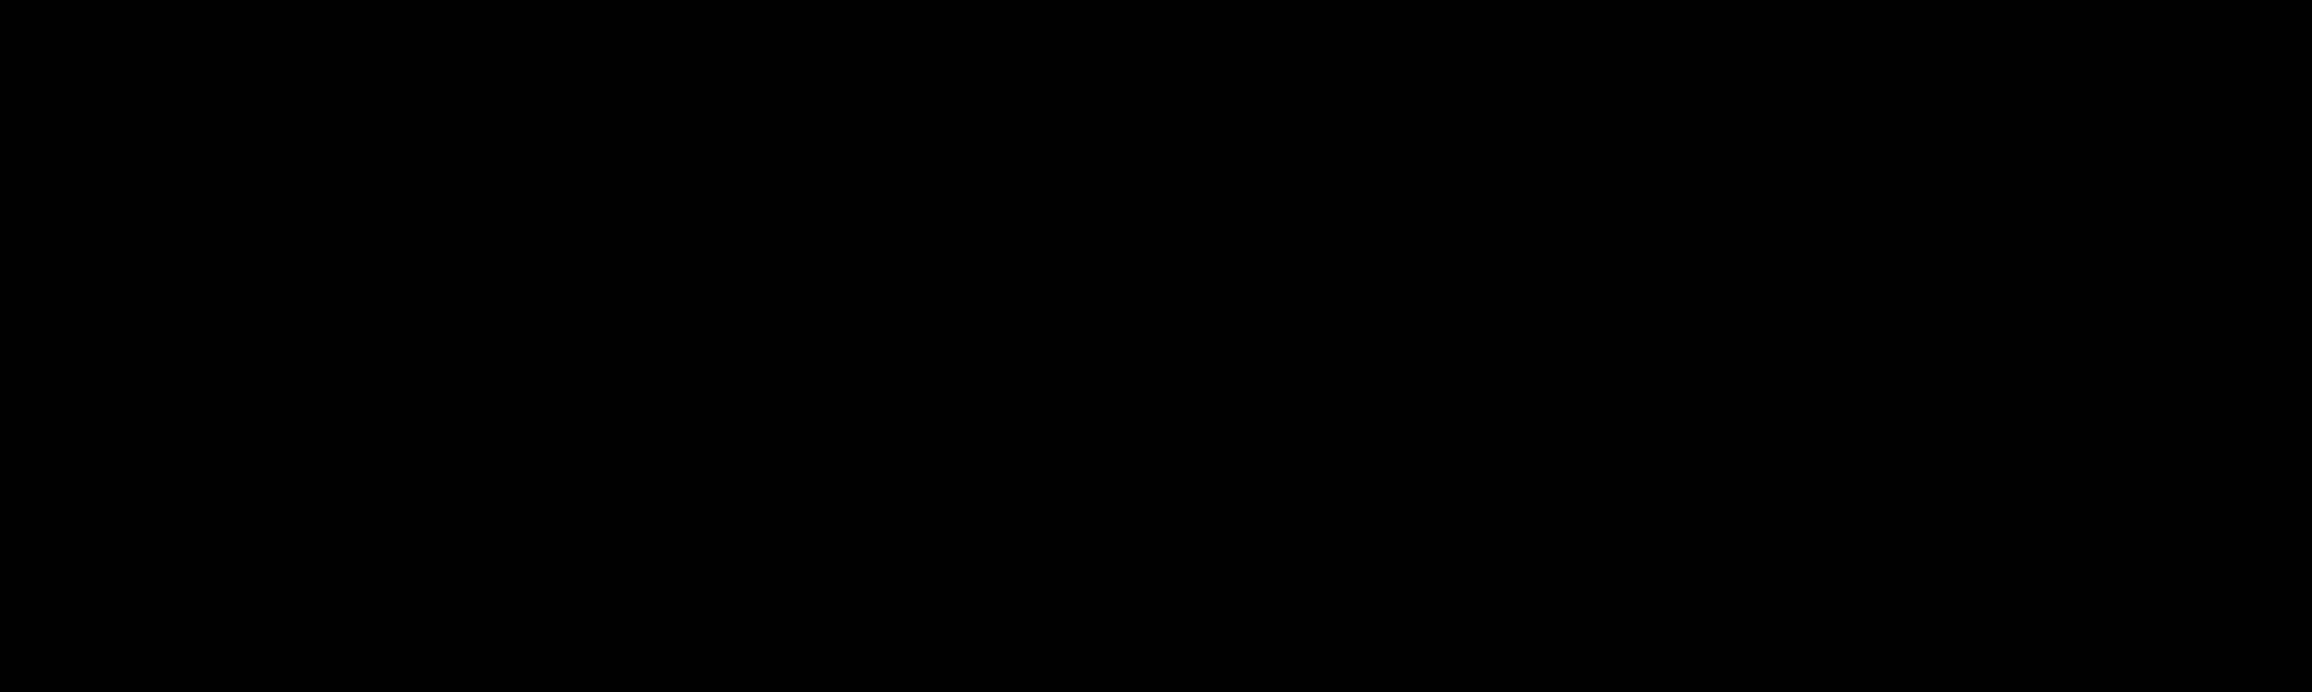 Curcumin-monoalkyne